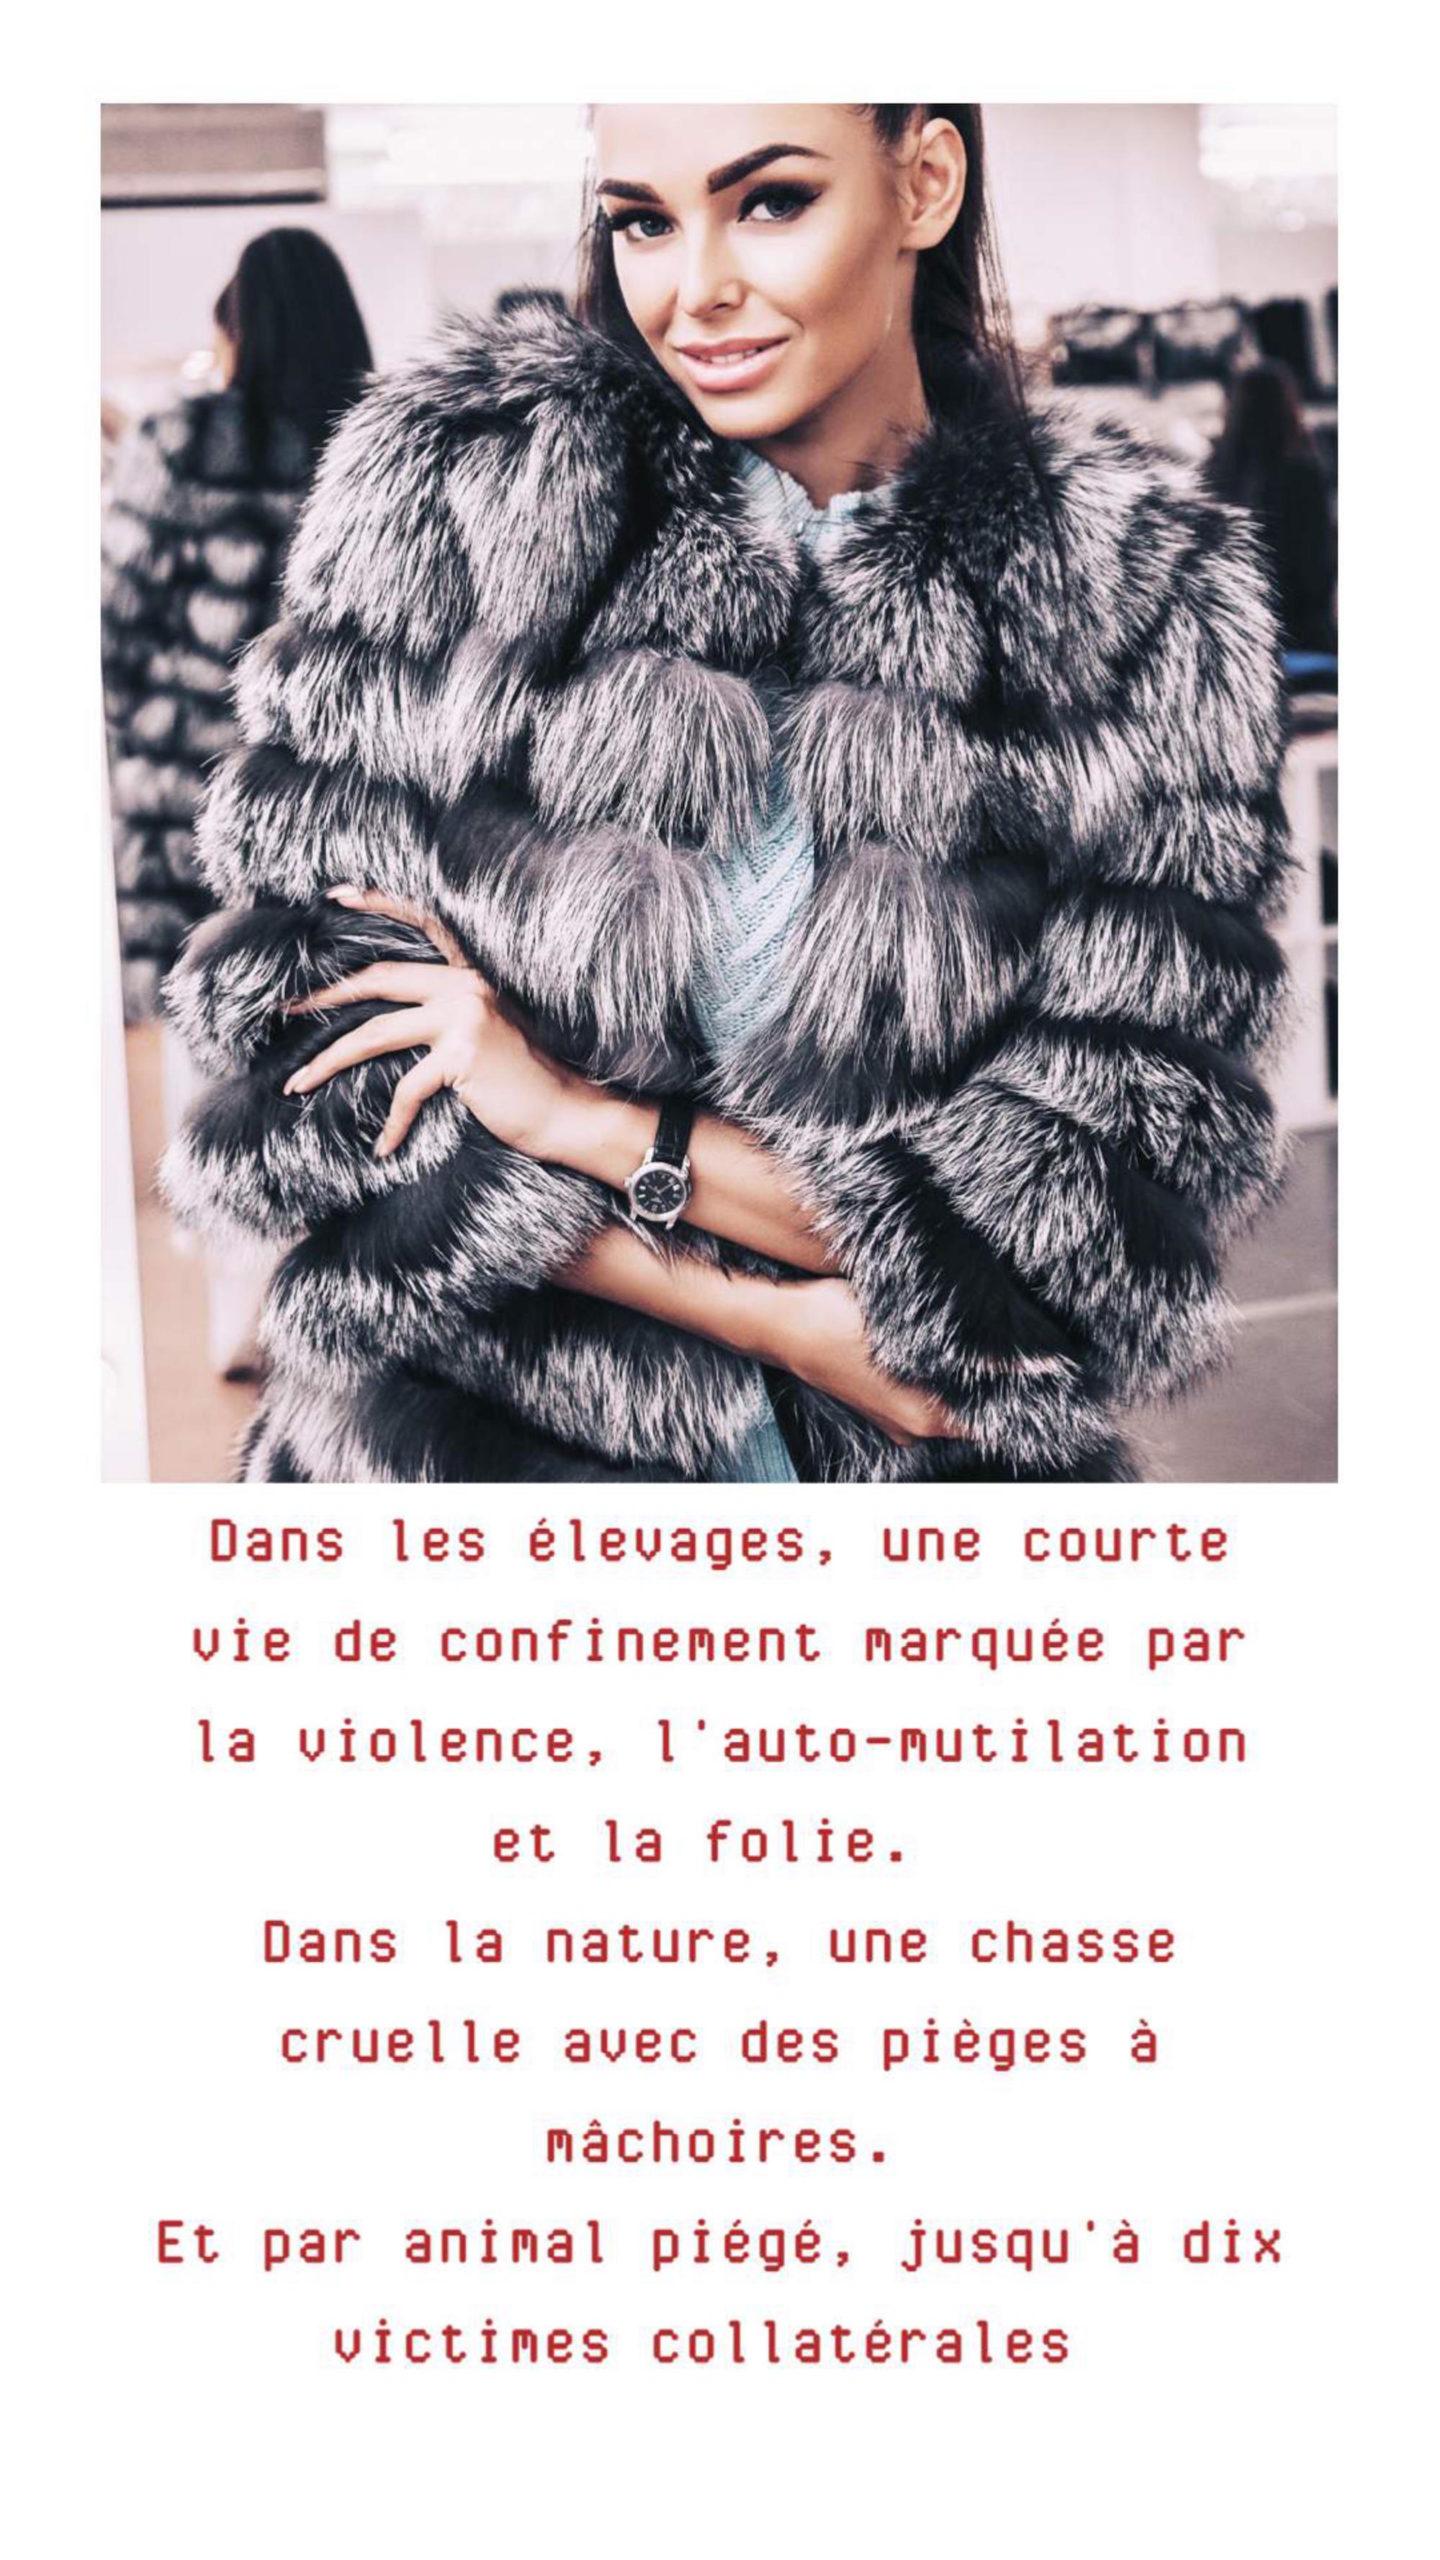 CATALOGUE-CAMPAGNE-ANTI-FOURRURE-page-13